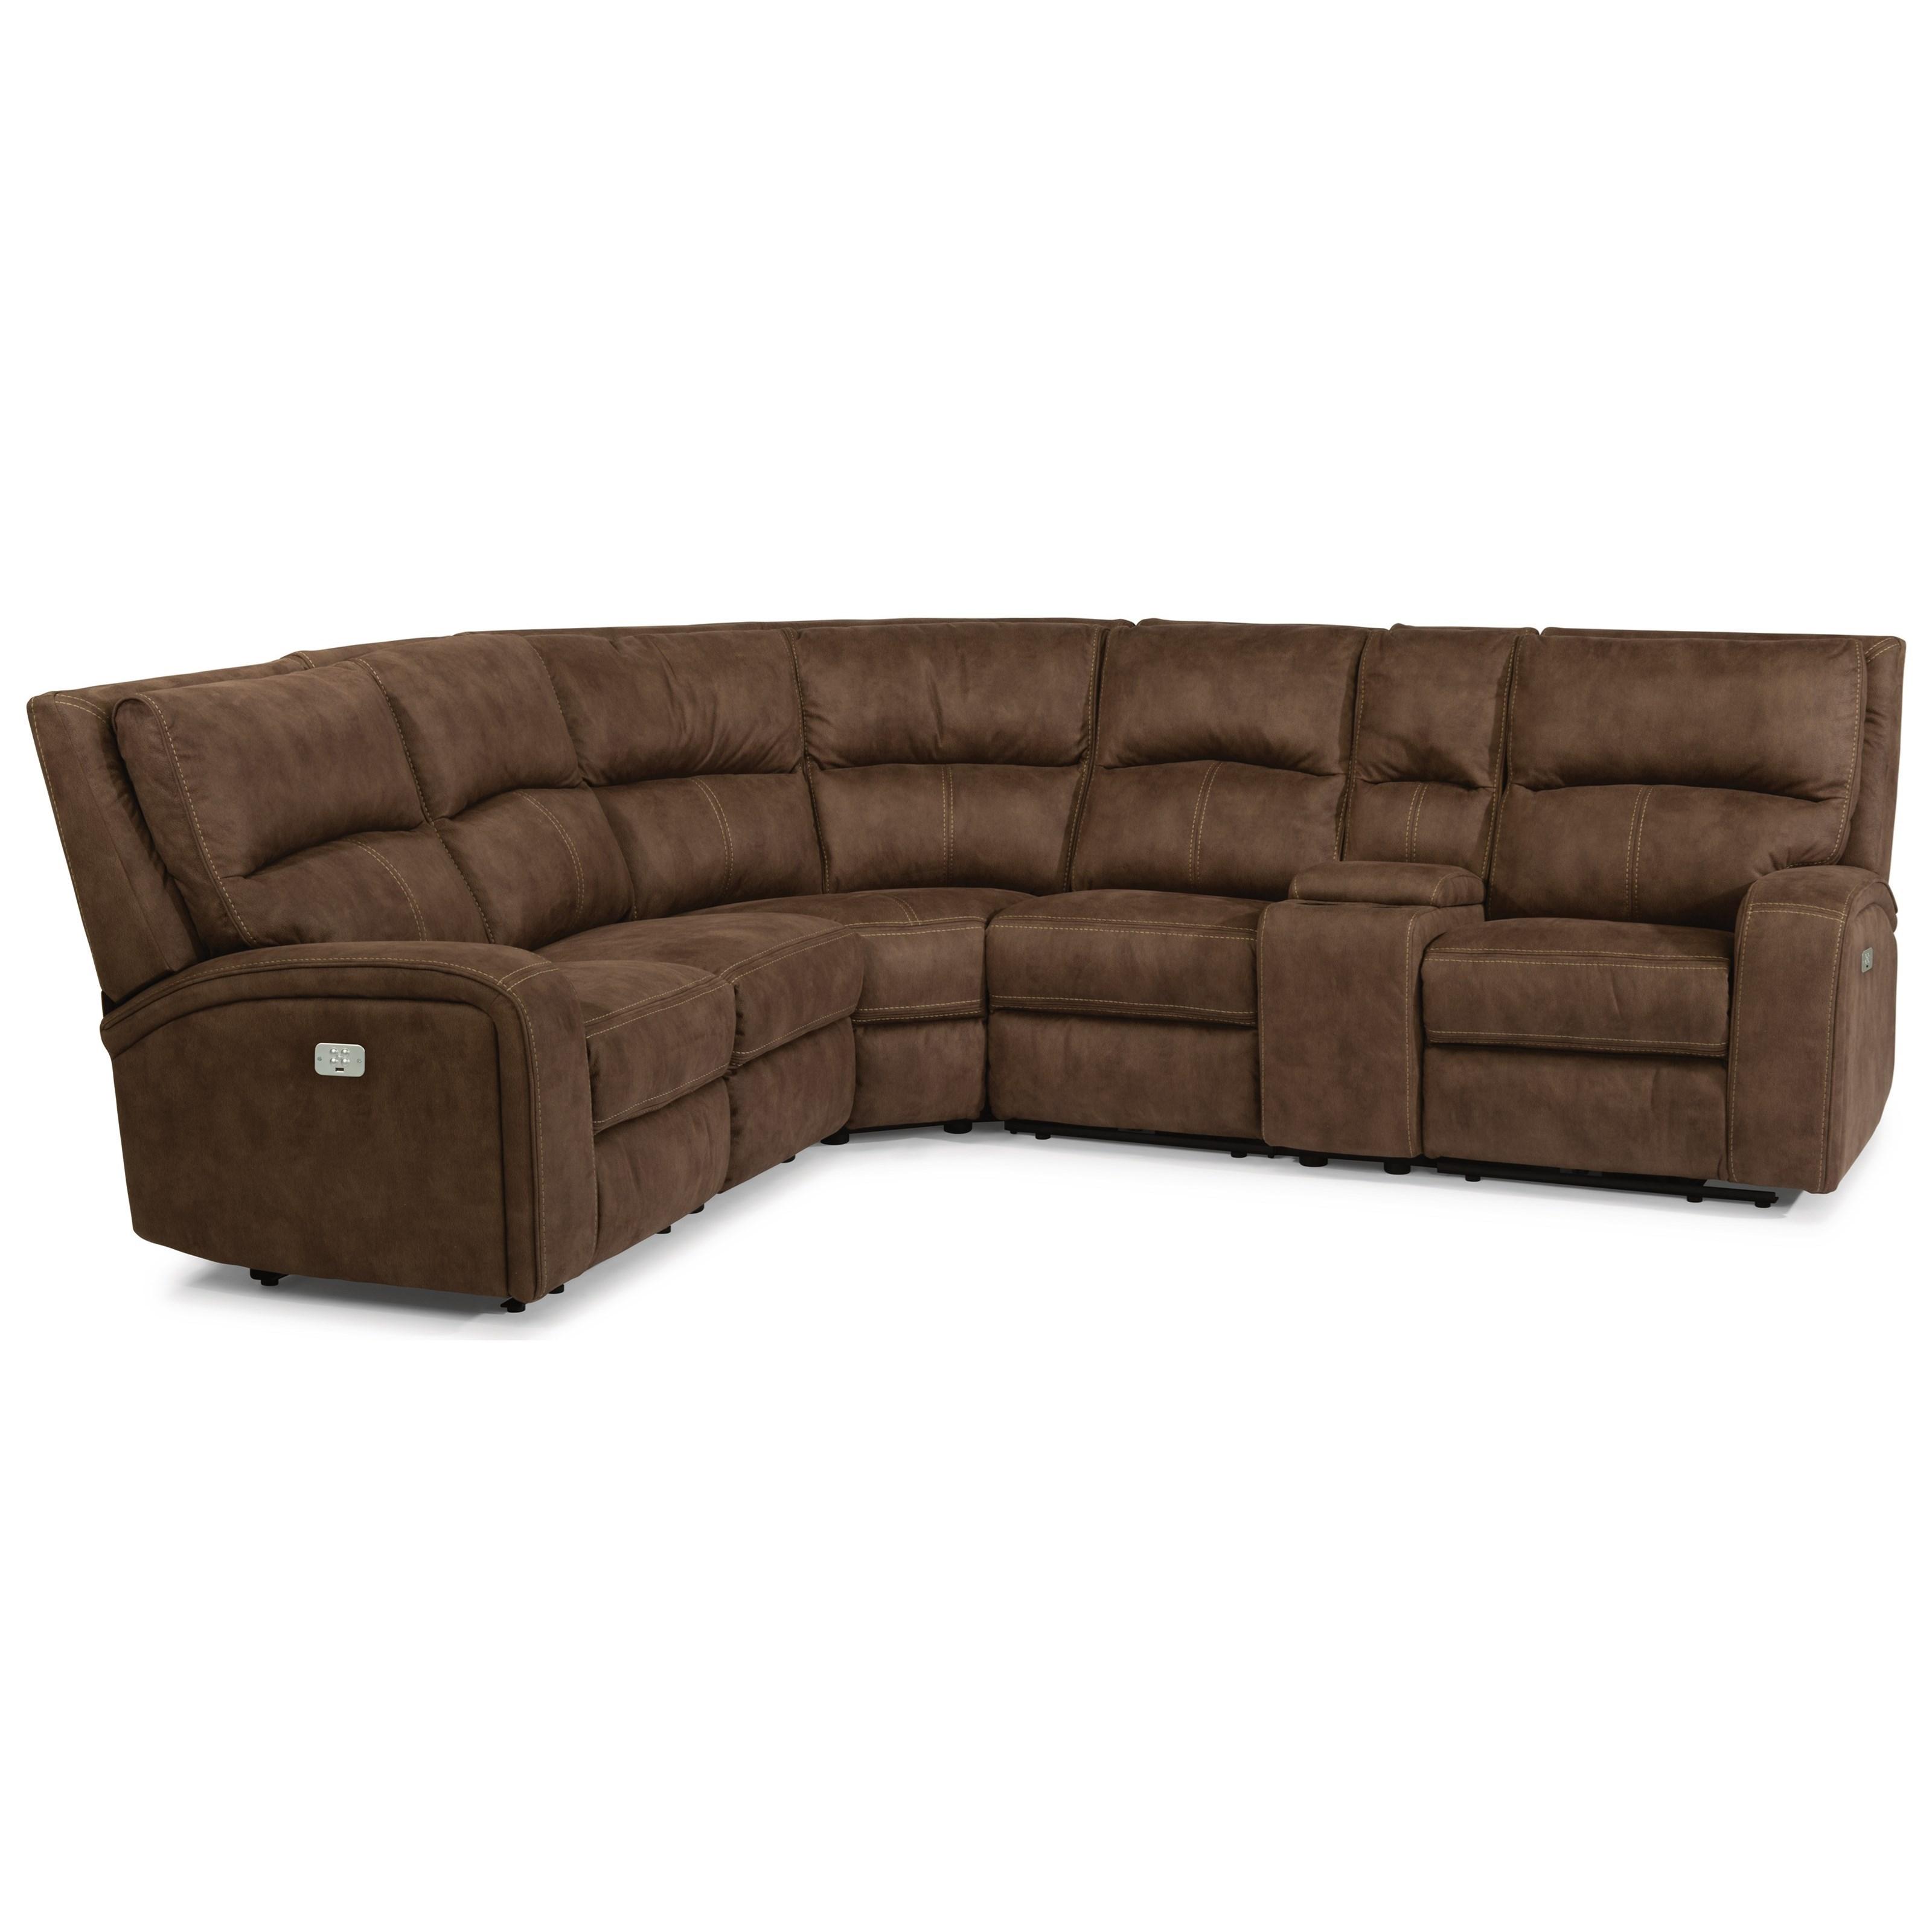 Flexsteel latitudes rhapsody contemporary power reclining for Sectional sofa seats 6